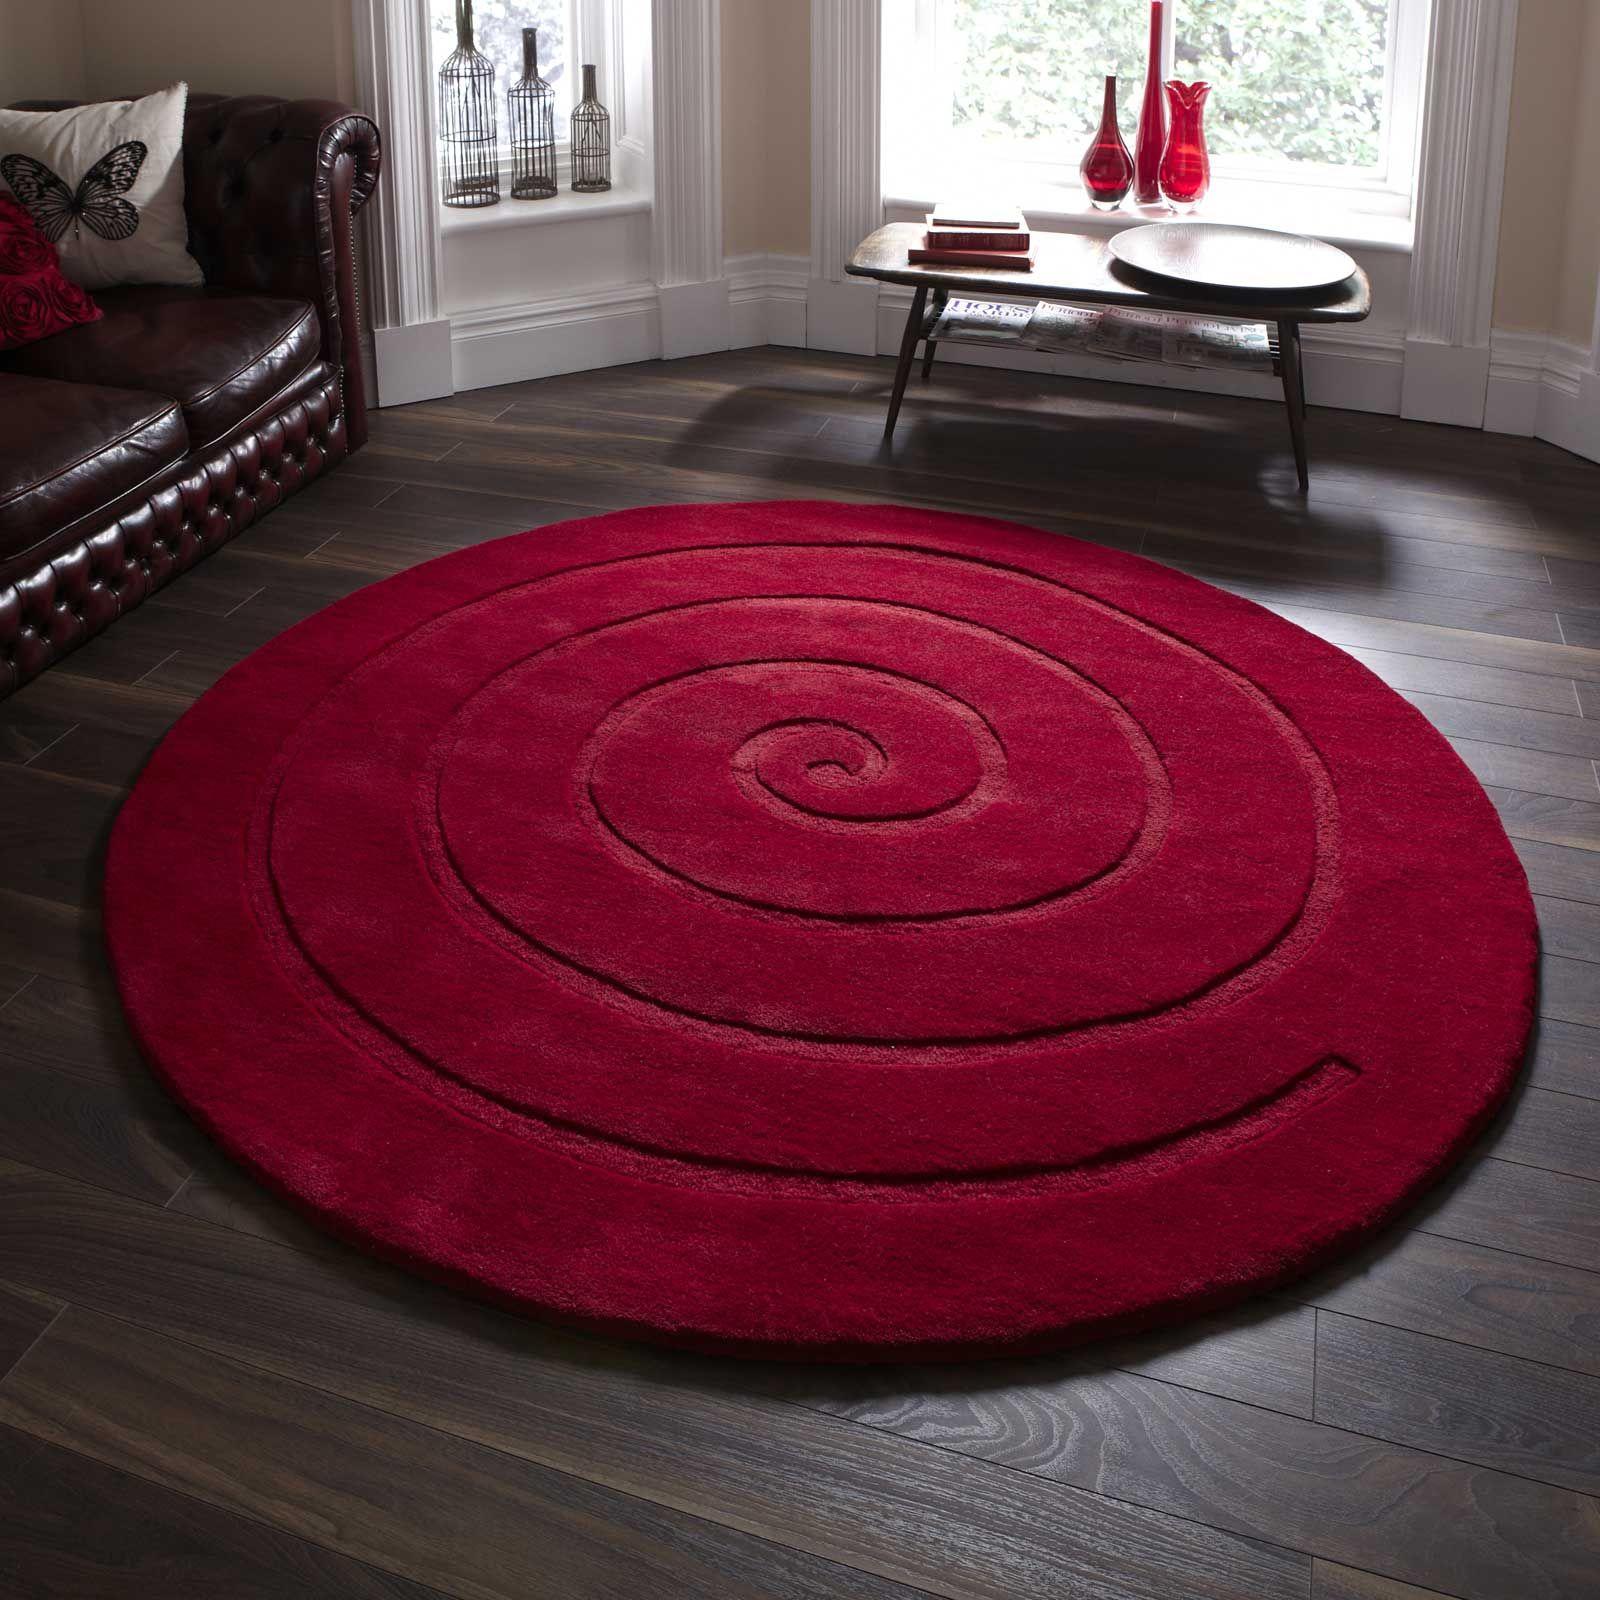 Spiral Circular Wool Rugs In